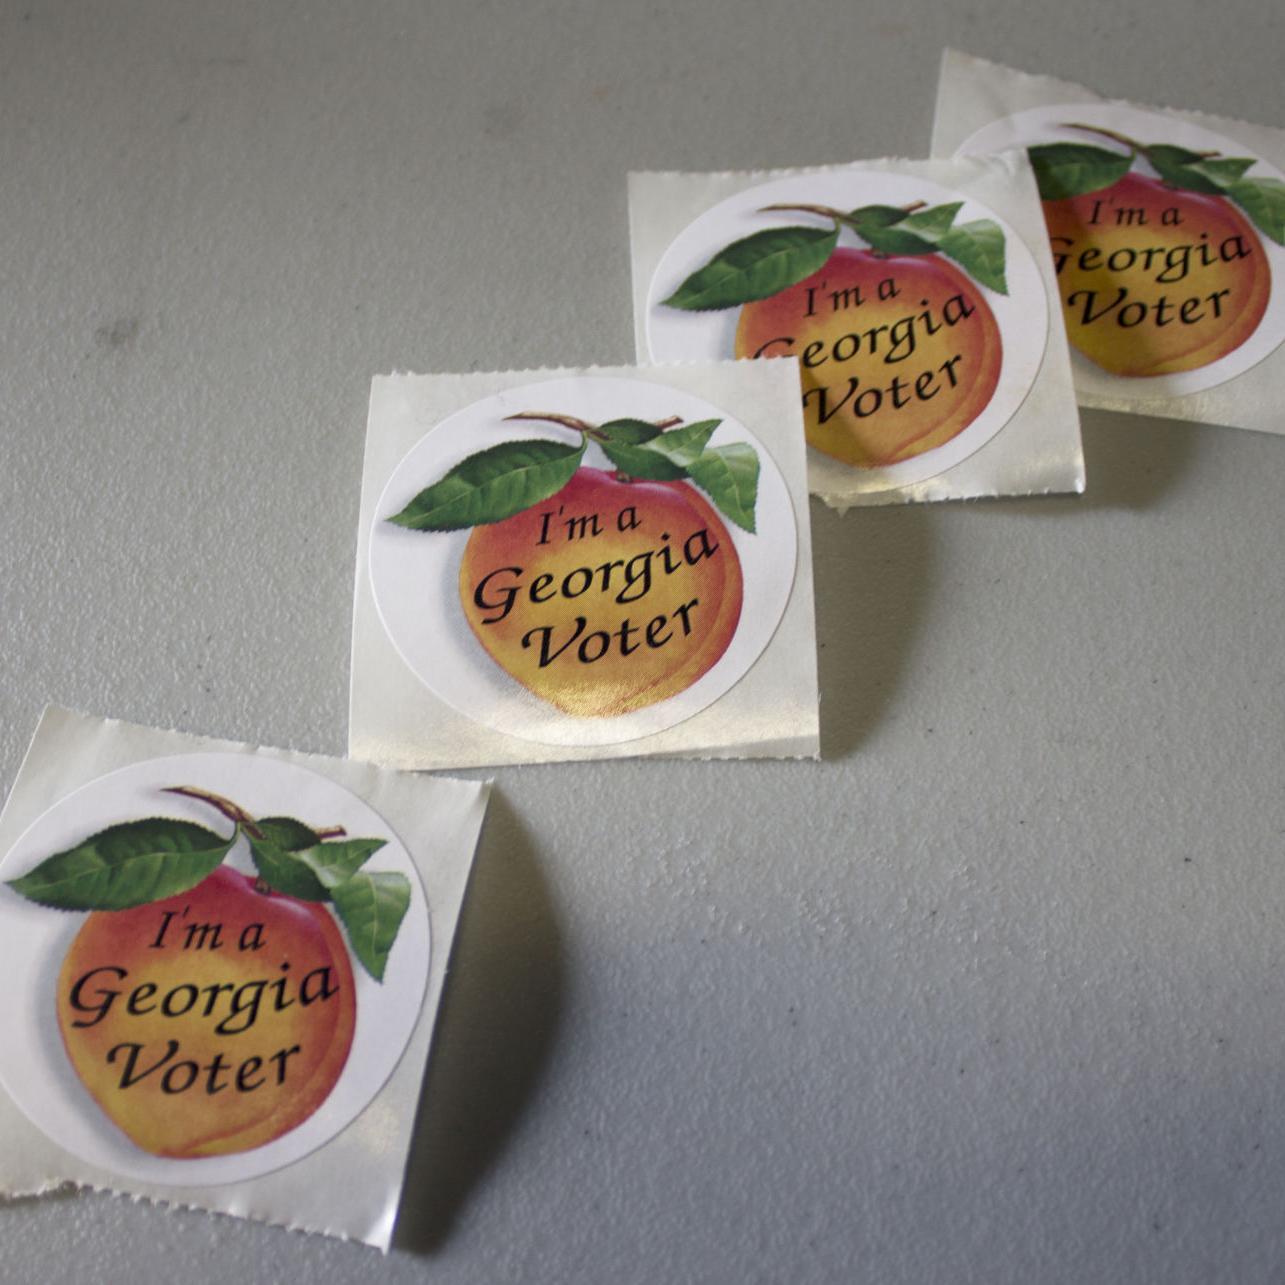 Dean declared Paulding school board Republican nominee after recount